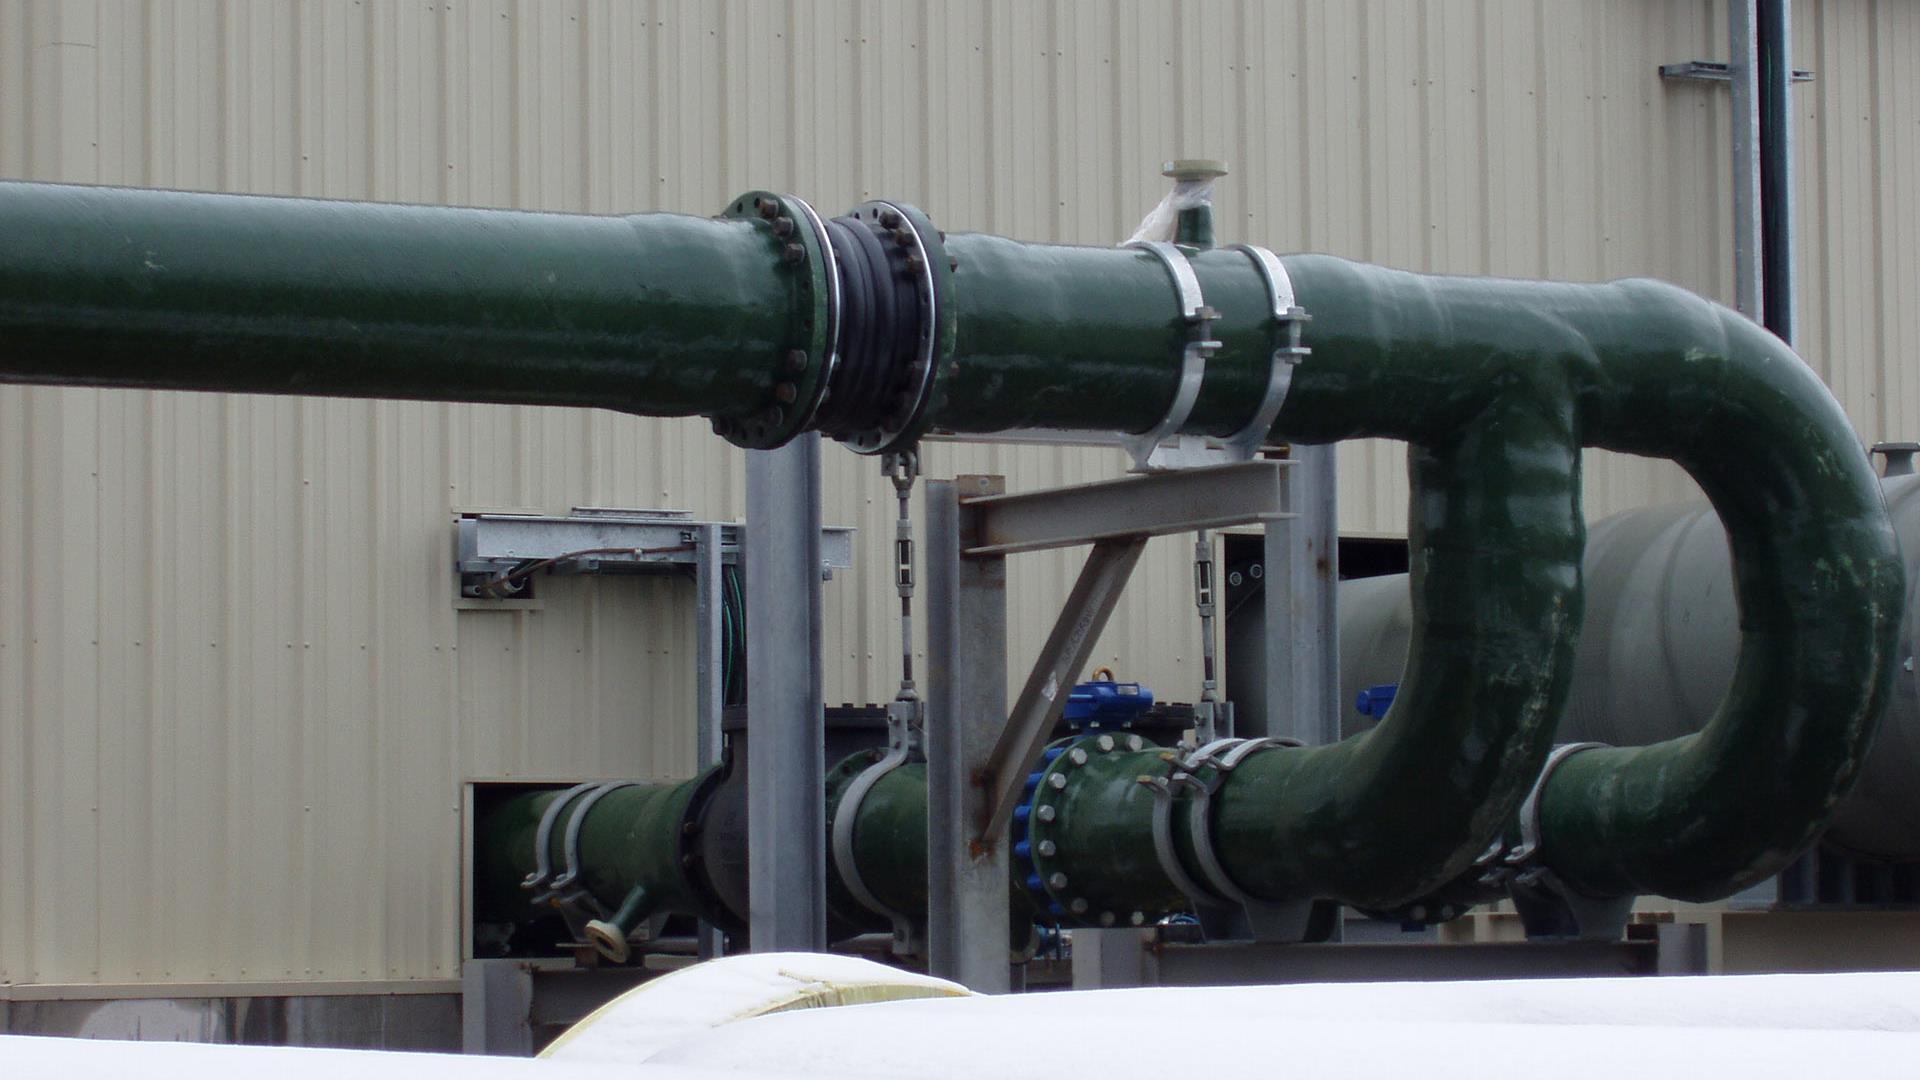 Side view of an assembled F-Chem Fiberglass Pipe